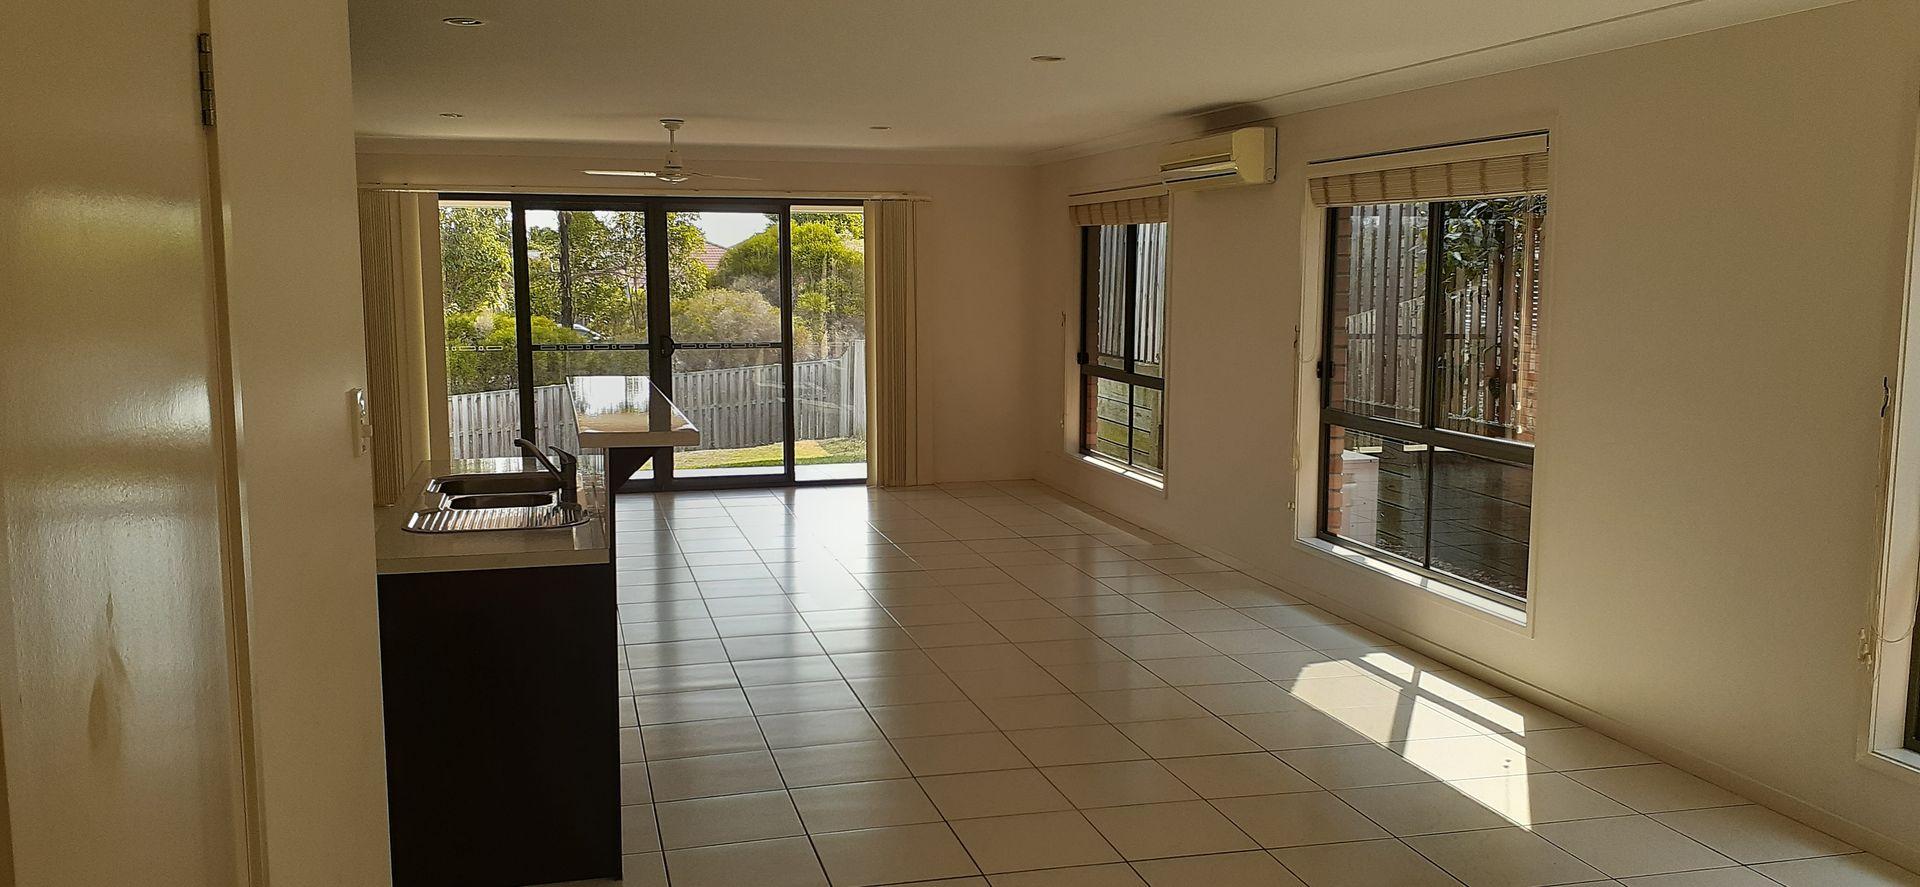 2/16 Pecan Drive, Upper Coomera QLD 4209, Image 1